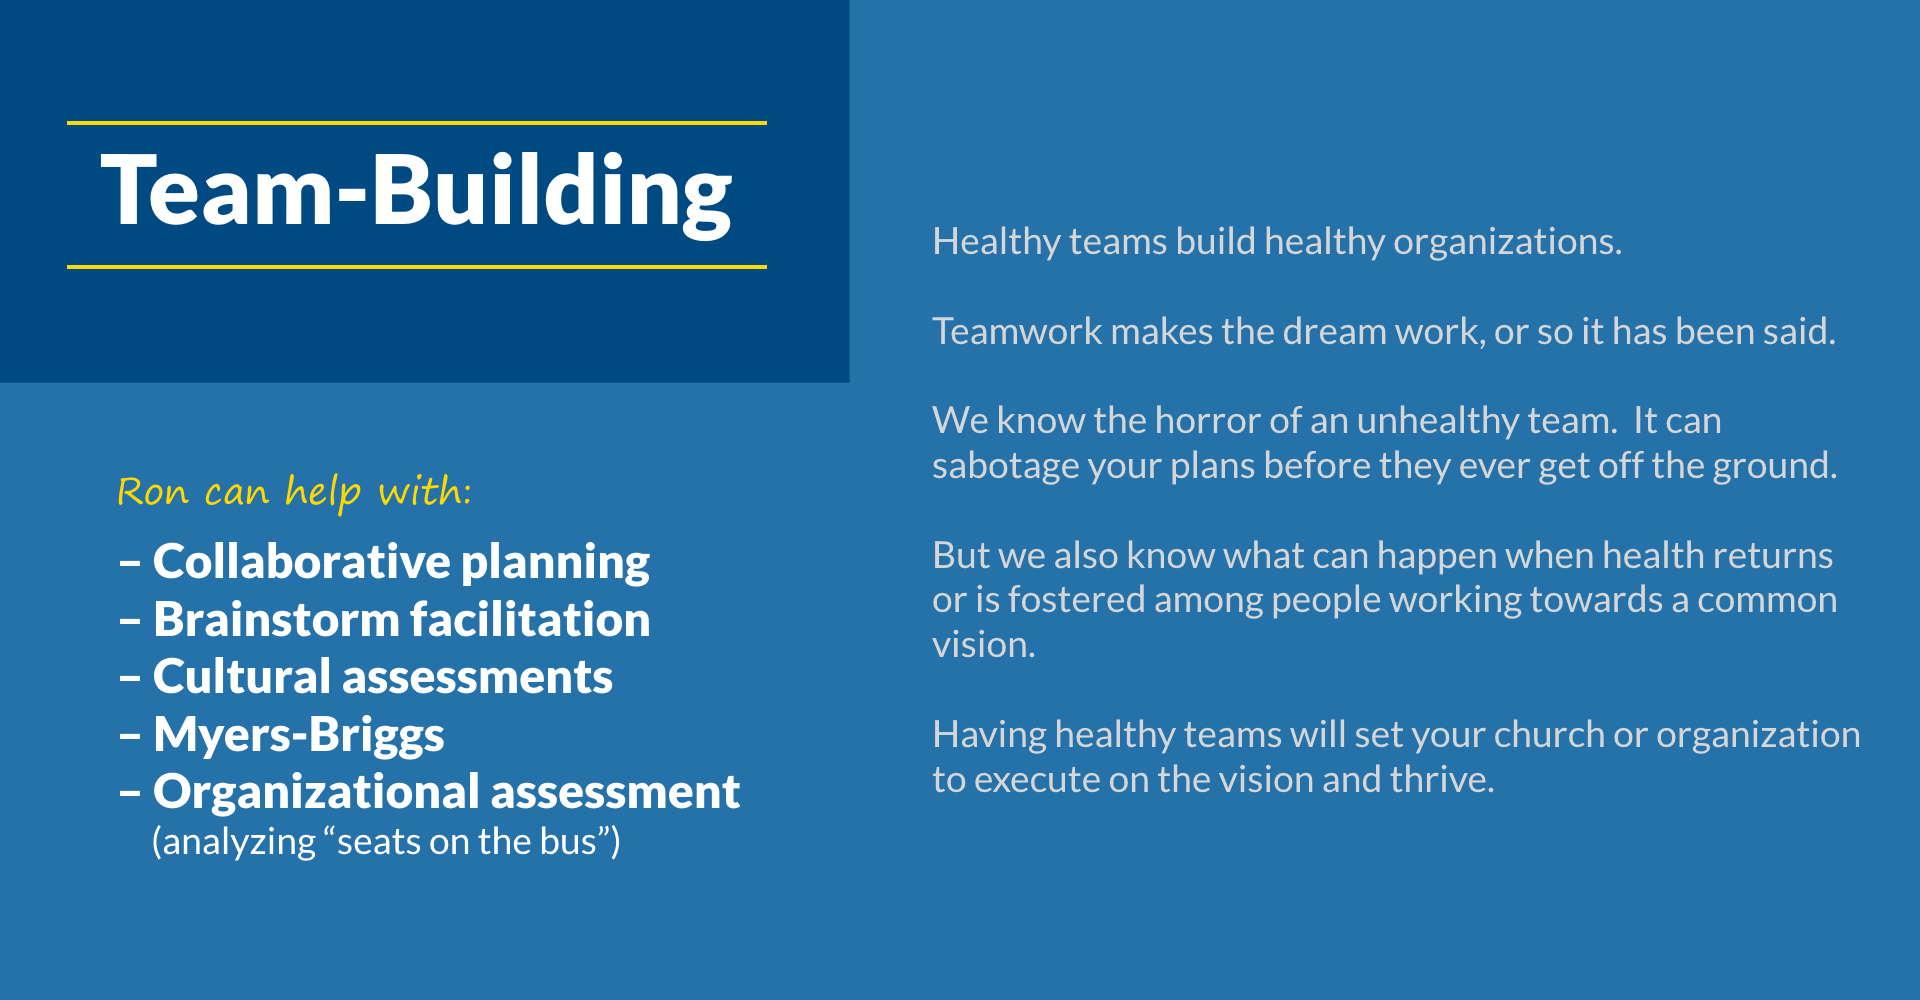 5T Leadership - Team Building - Ron Edmondson Leadership Coaching